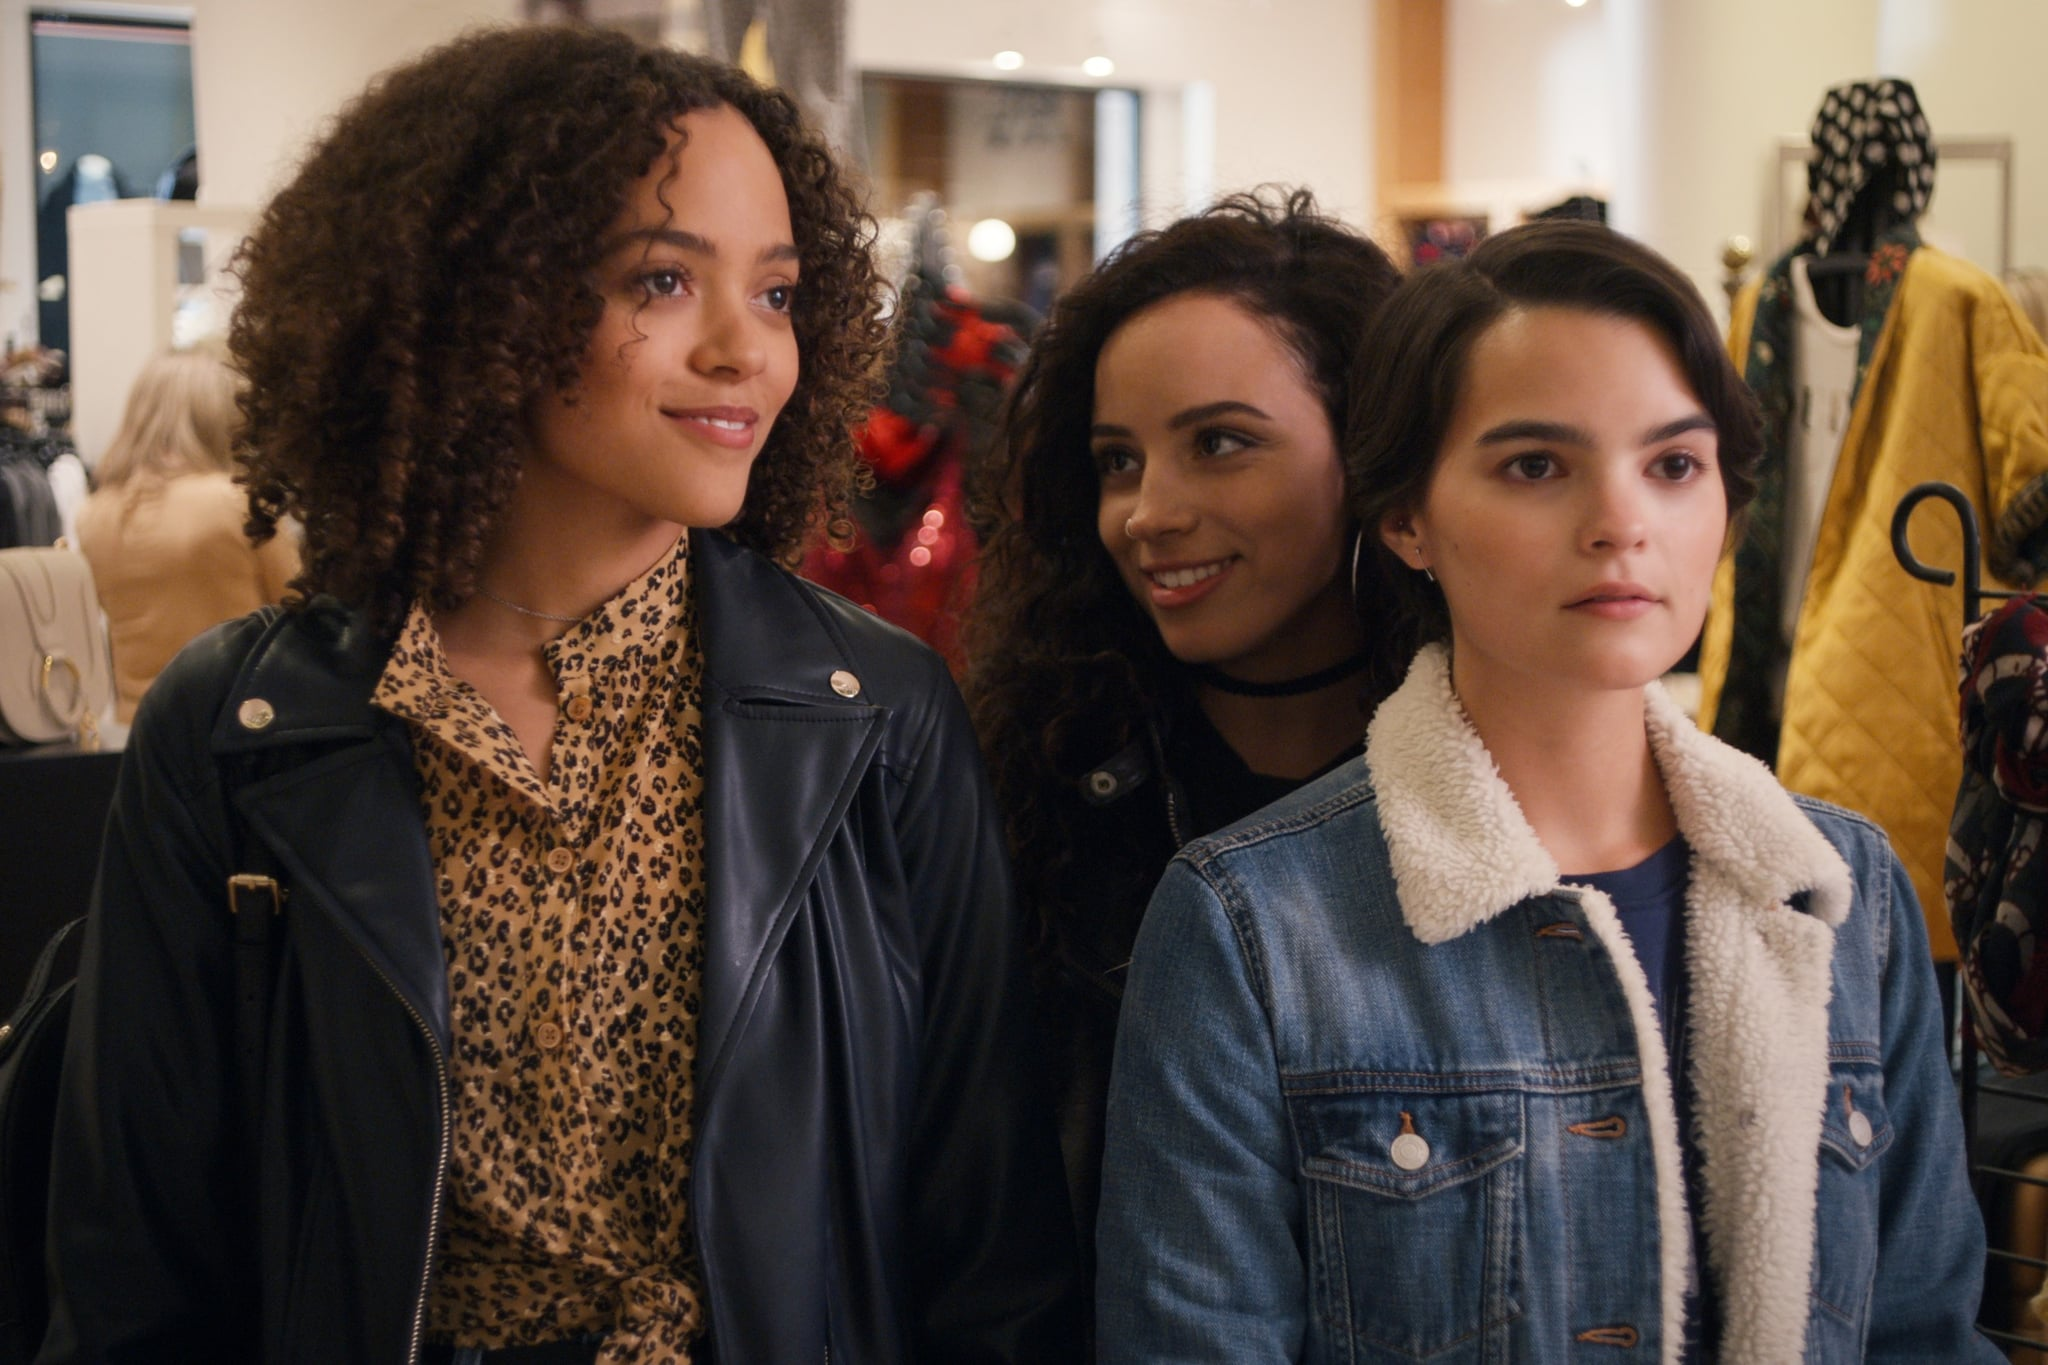 TRINKETS, from left: Quintessa Swindell, Kiana Madeira, Brianna Hildebrand, (Season 2, ep. 202, aired Aug. 25, 2020). photo: Netflix / Courtesy Everett Collection